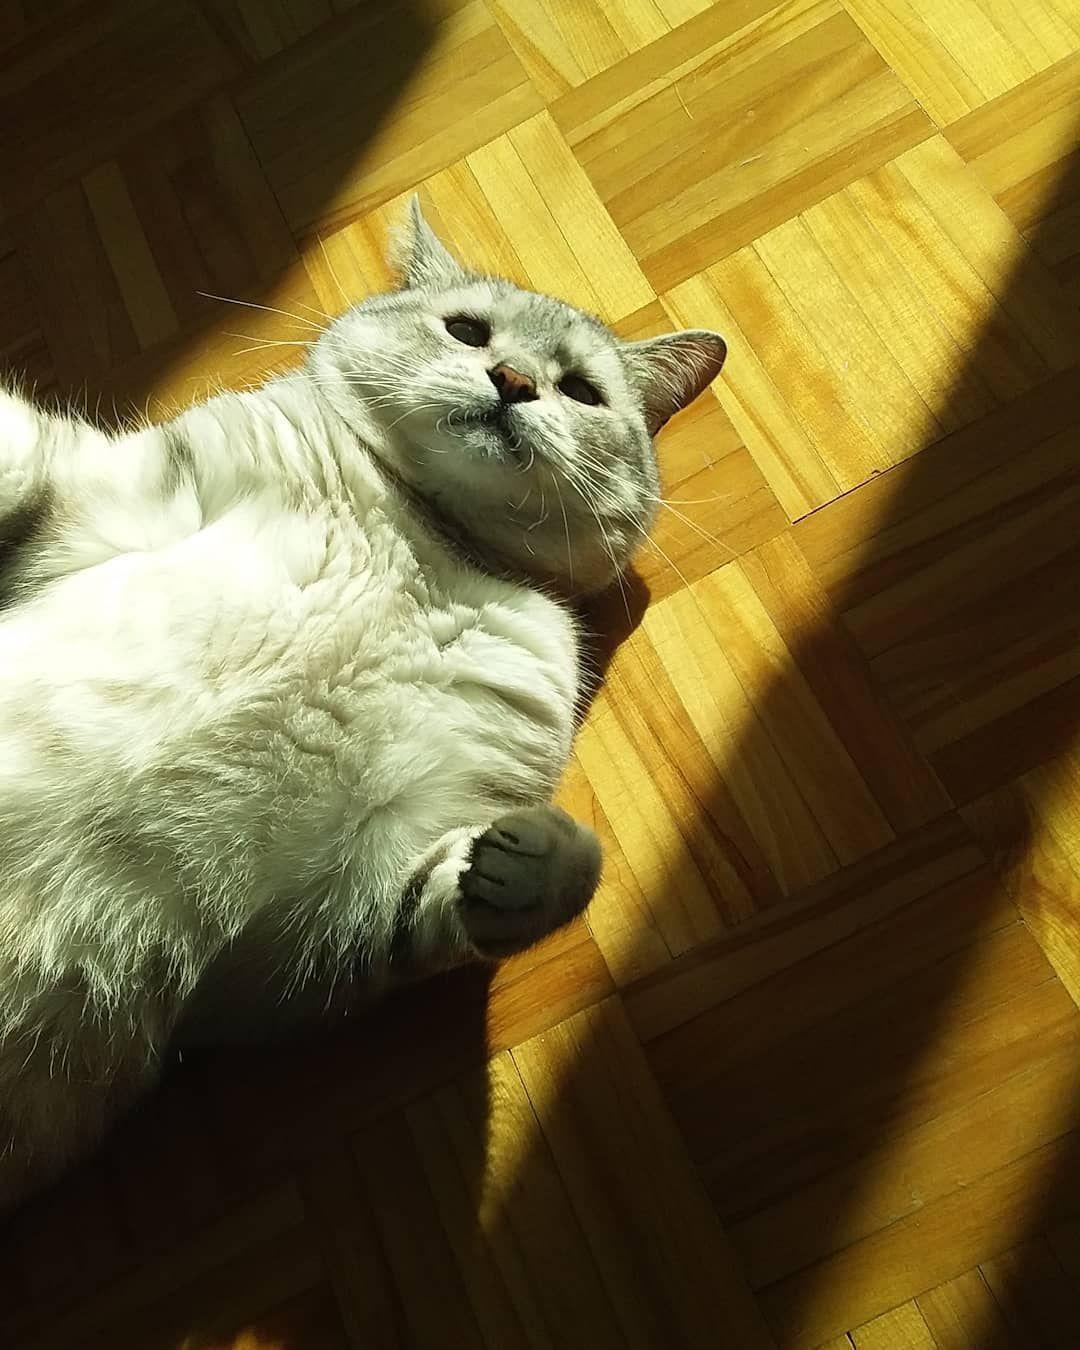 A sunny day • • • • • • • • #gatos #gatineos #gatitos #gatodeldia #catsarebeatifull #catsoftheday #mood #wildlife #cats_of_instagram #cats #catsfollowers #catsofig #cats🐱 #catsoftheworld #canada #catlife #catlovers #cats_of_instworld